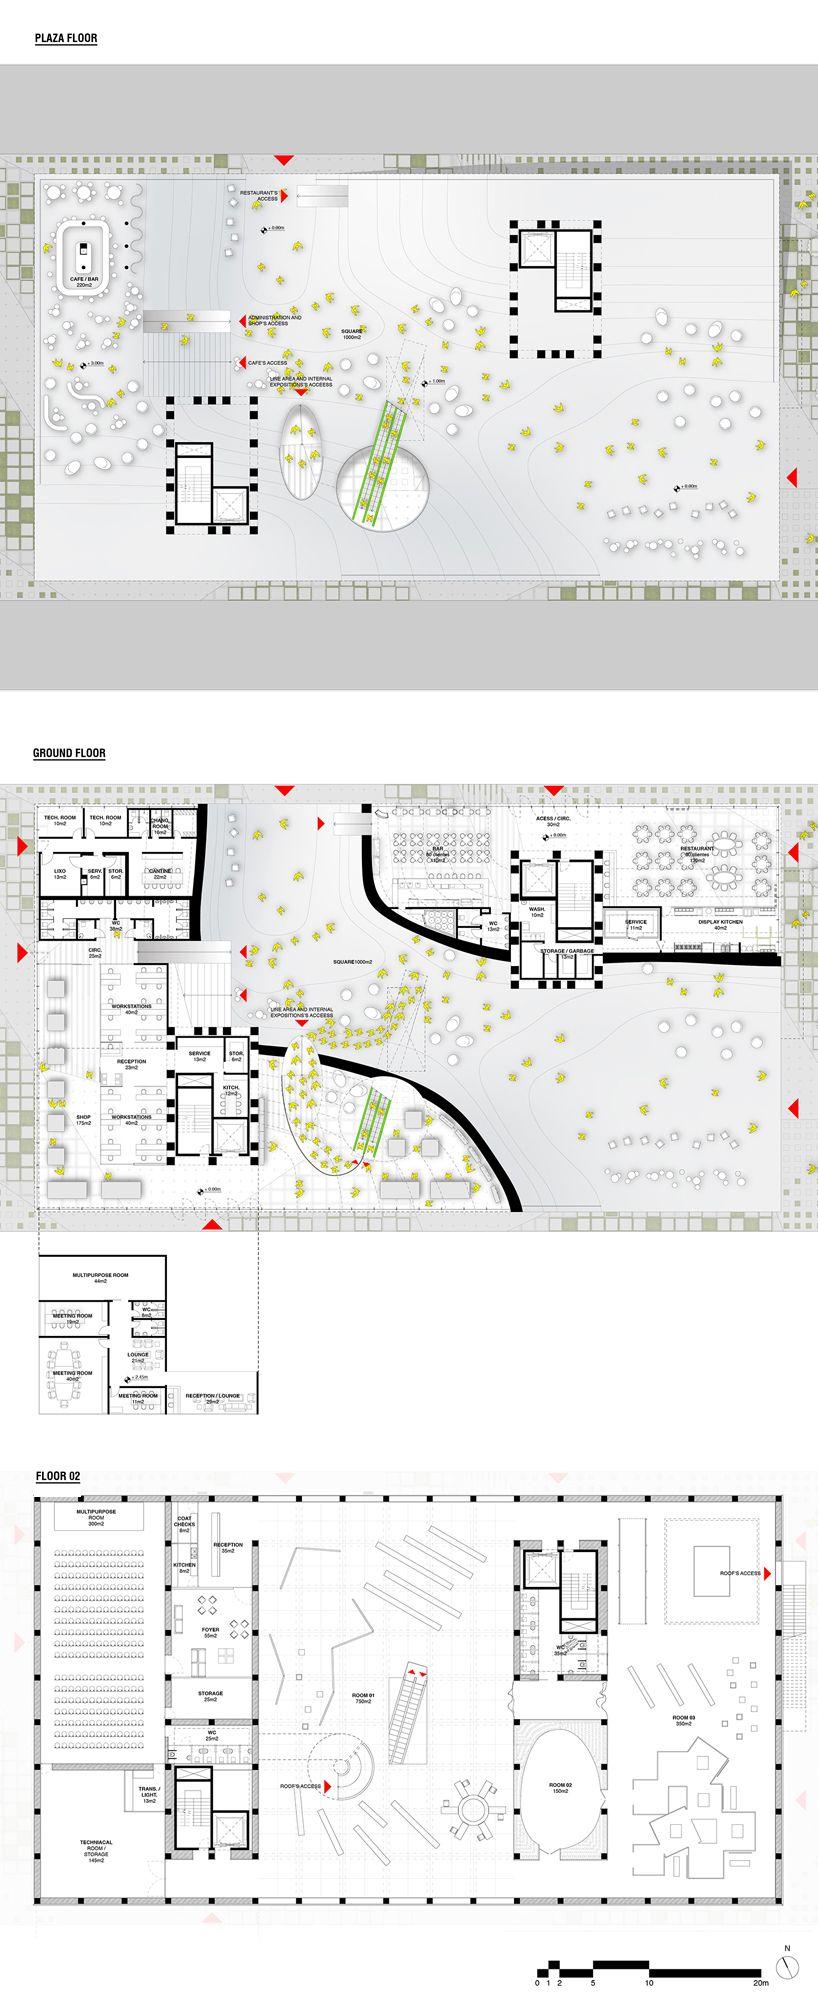 brazilian pavilion proposal for milan expo 6 by be.bo + mira